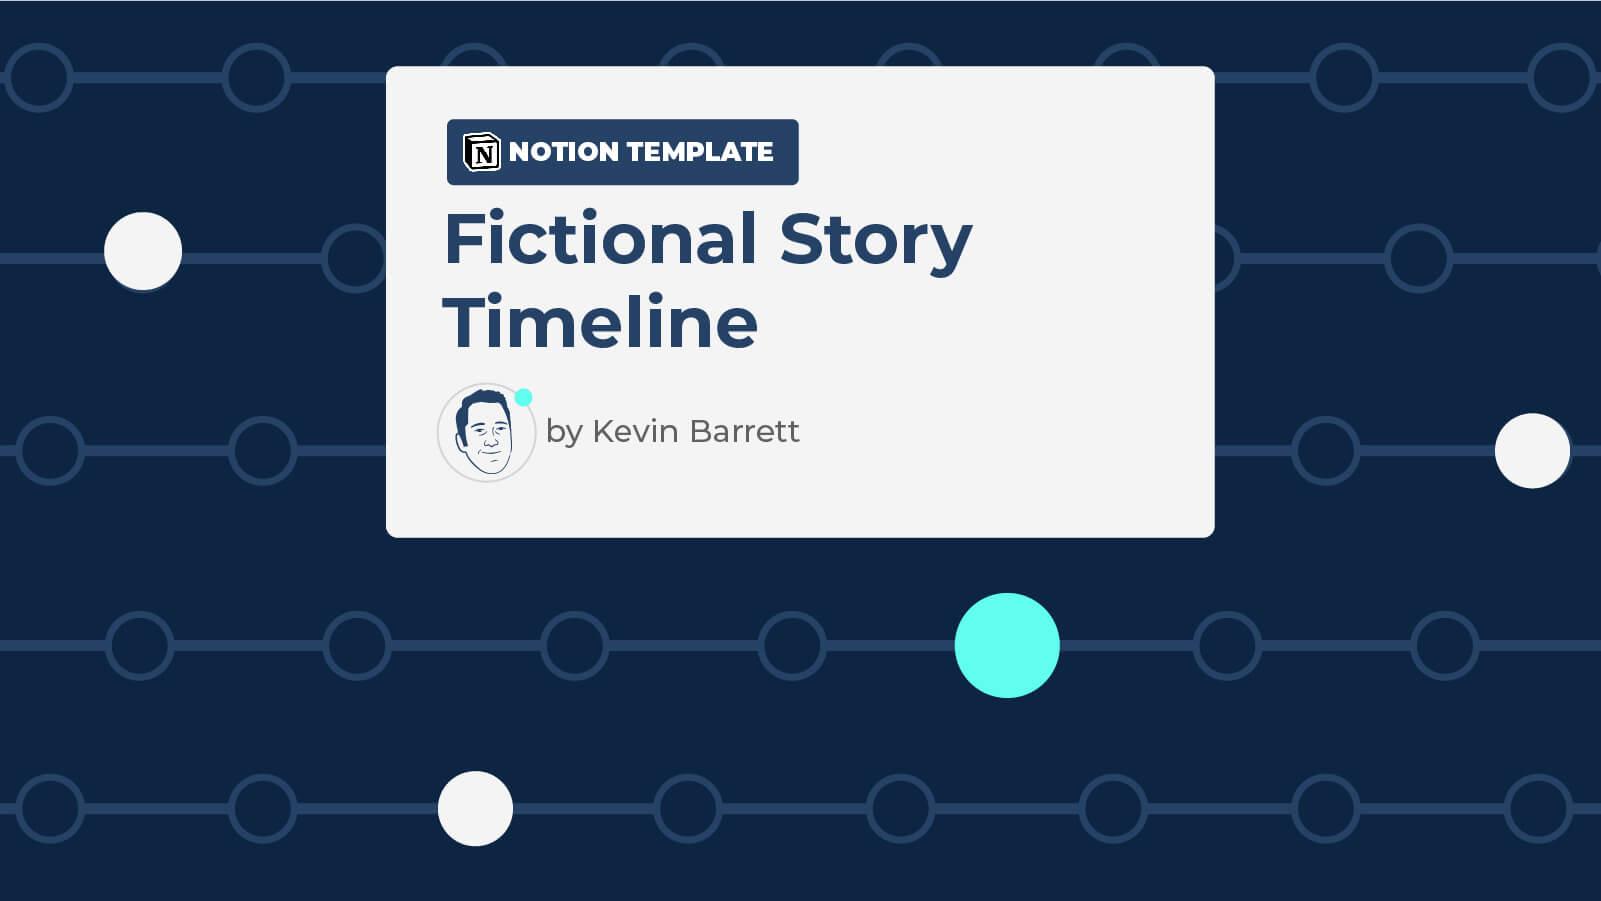 Fictional Story Timeline